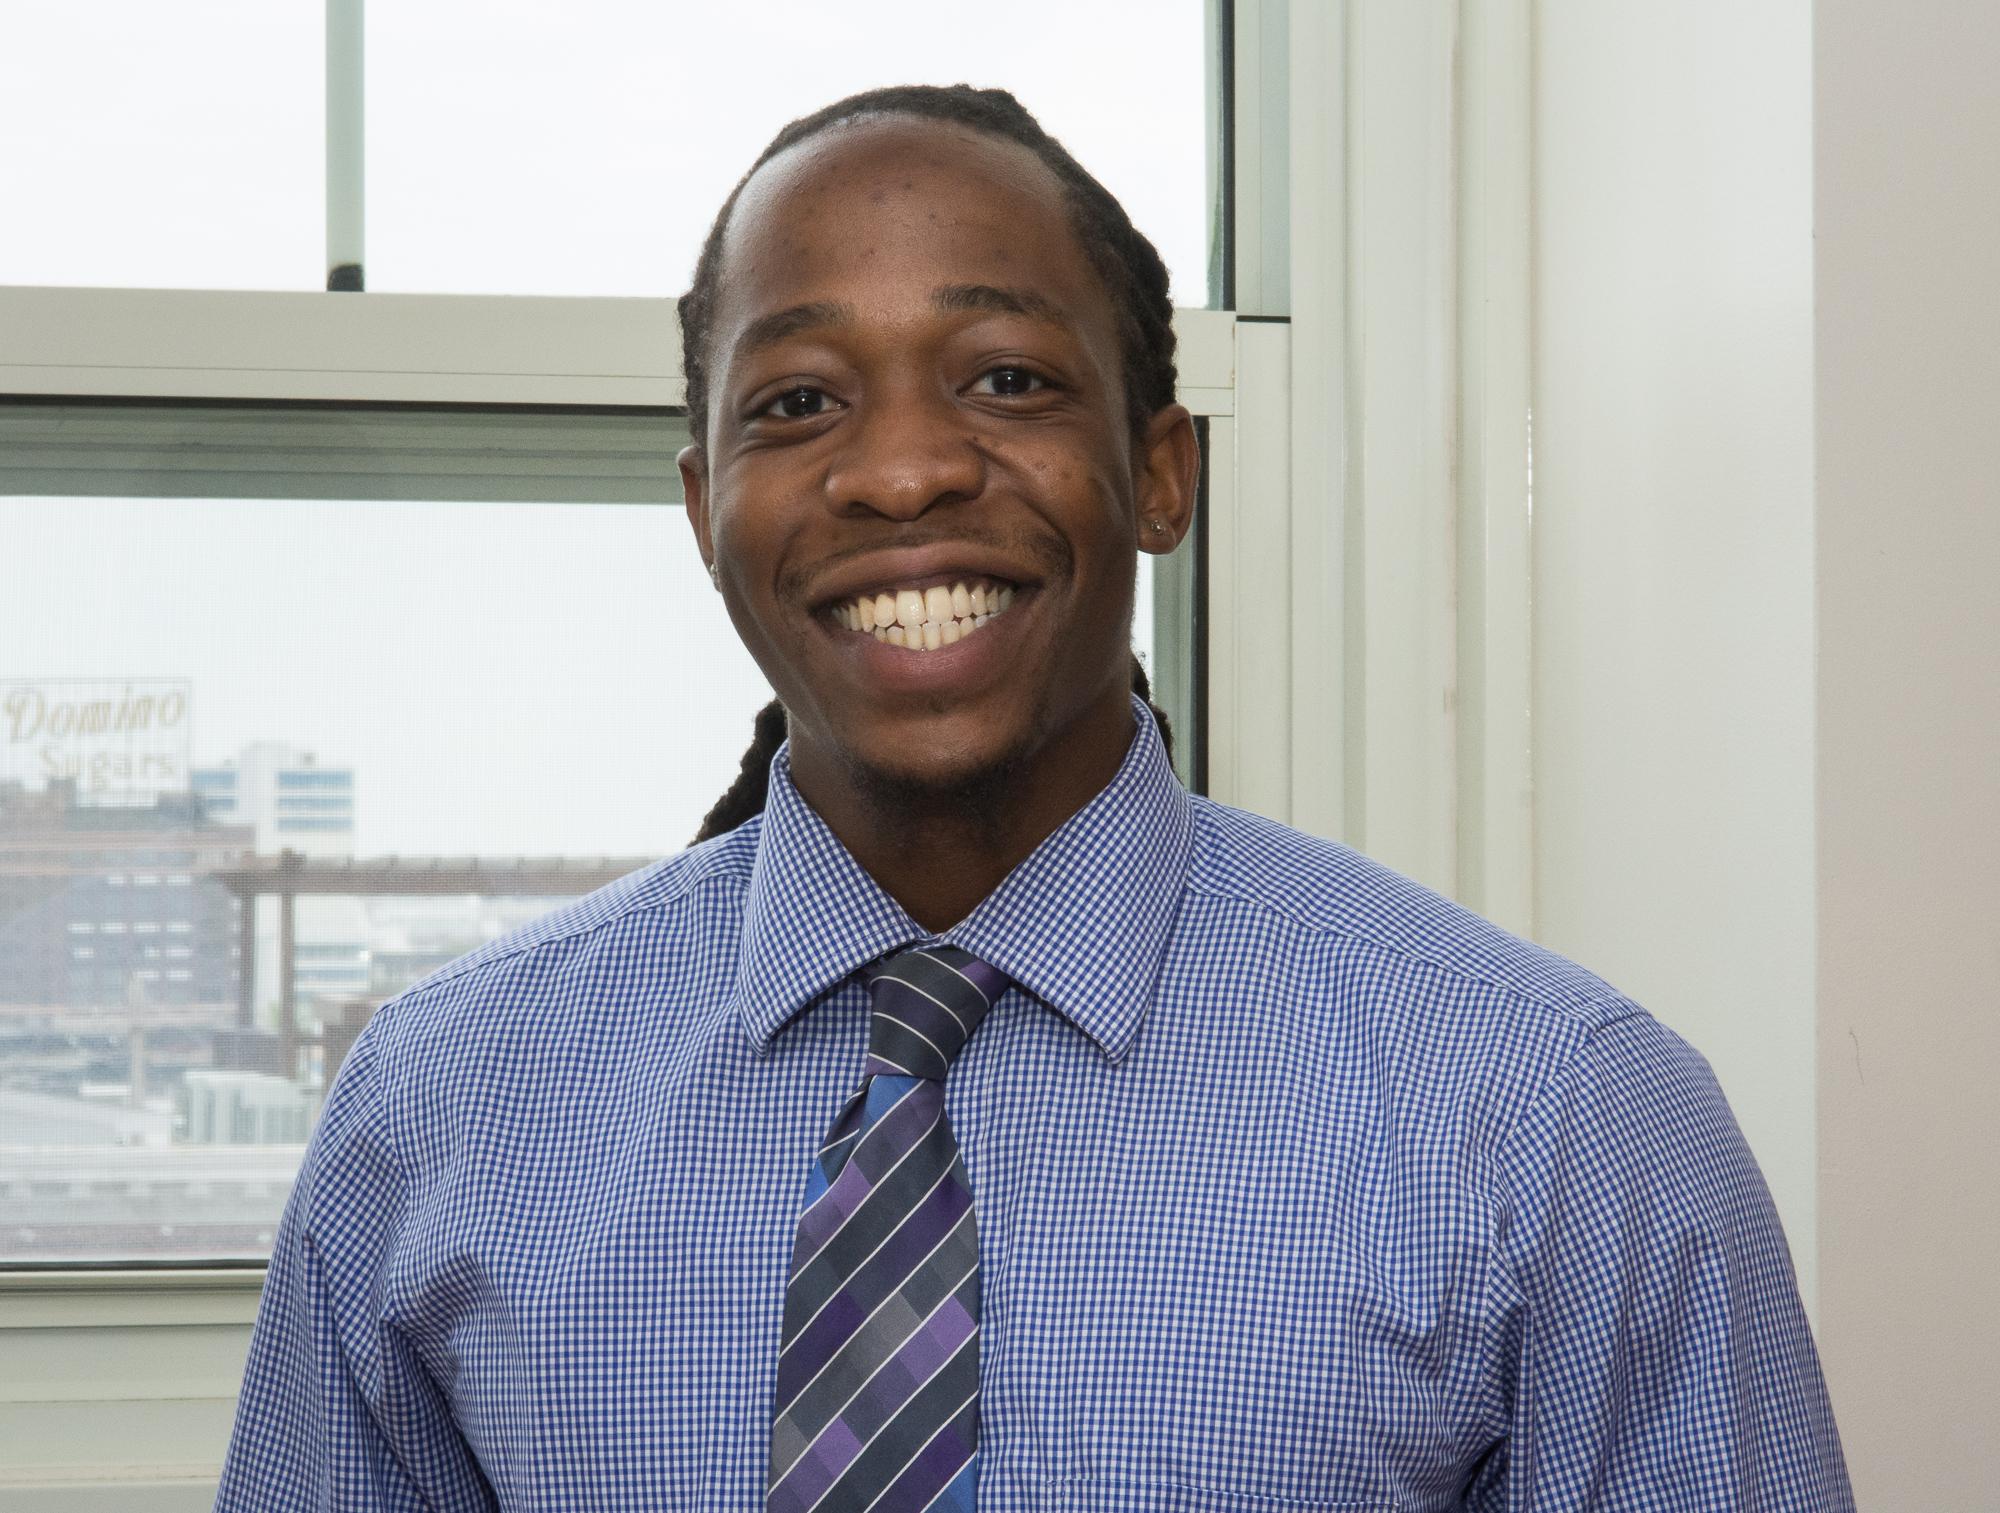 Abraham Attenoukon '03   - Asst. Admissions Director,  6th grade Social Studies; 8th grade Religion  B.A. University of Maryland 410-539-8268 ext. 501